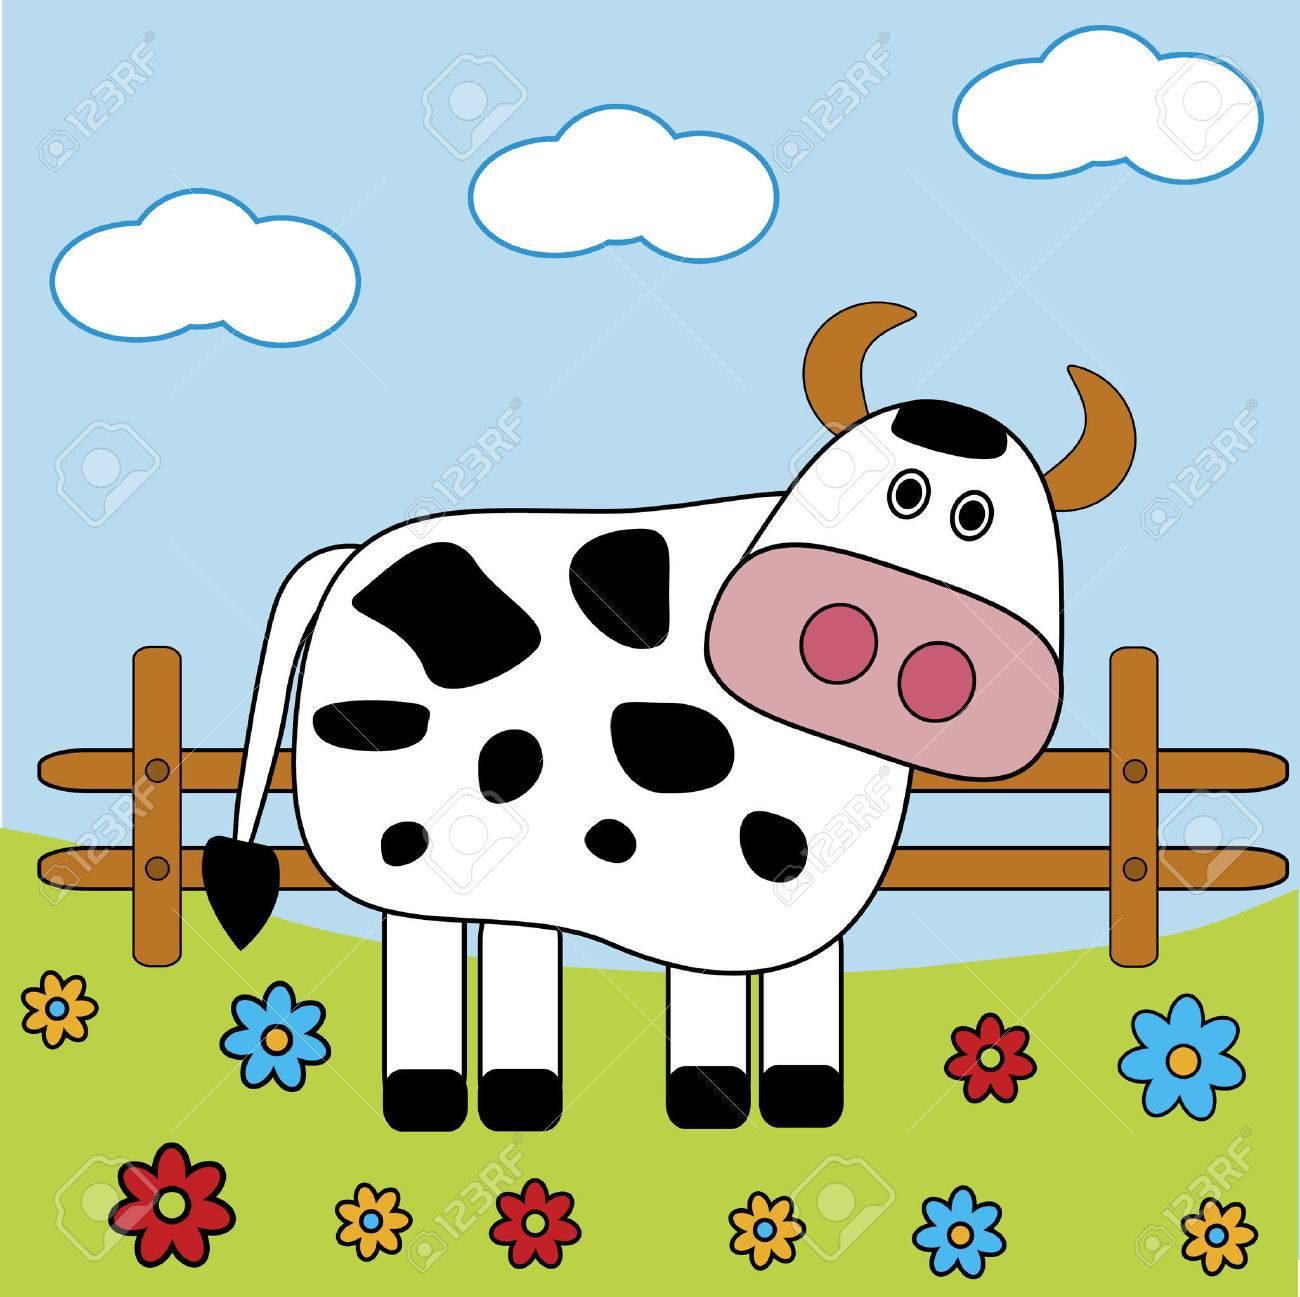 Cow Stock Vector - 3770393